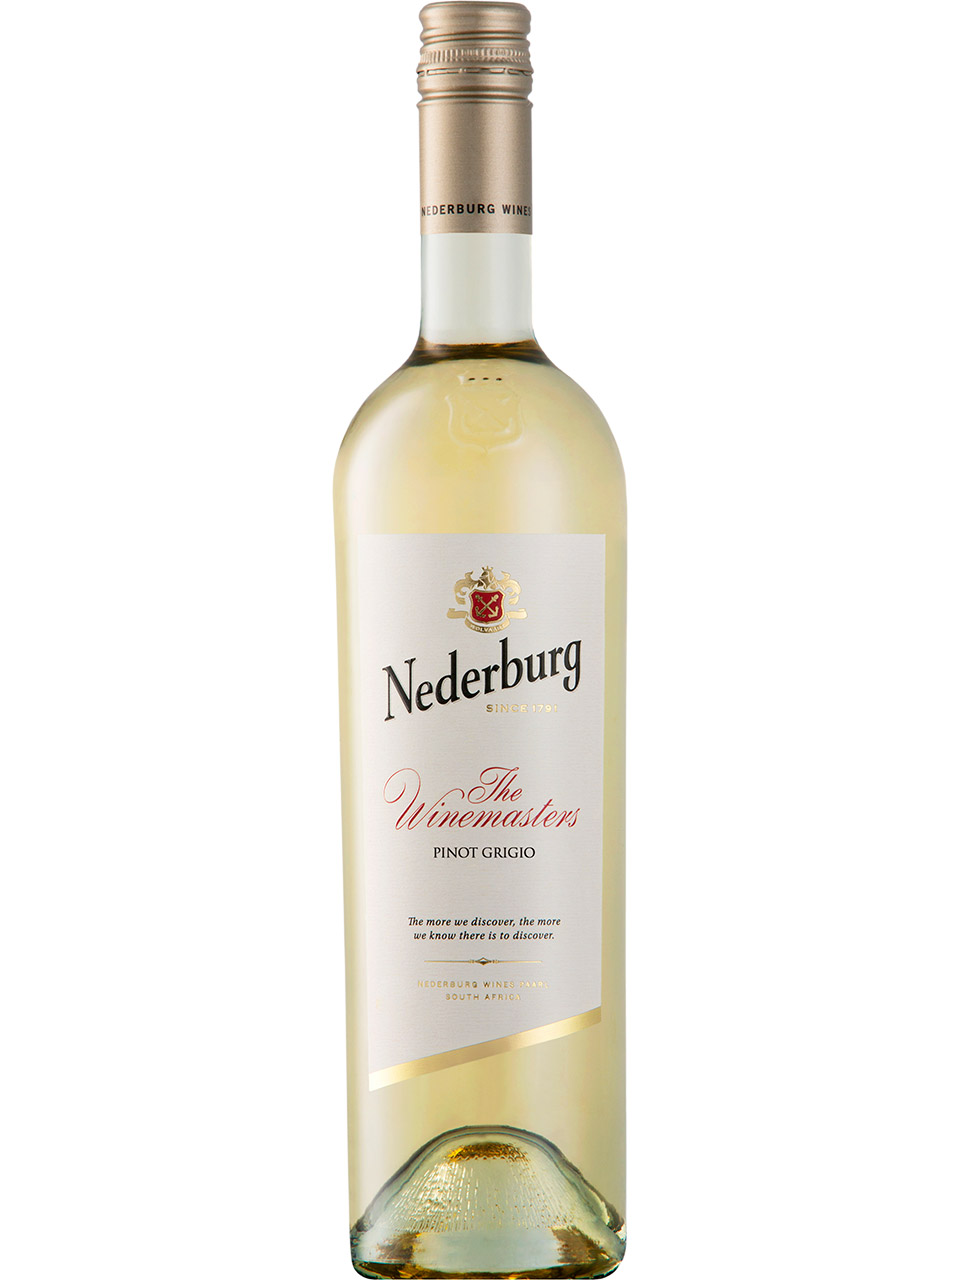 Nederburg The Winemaster's Pinot Grigio